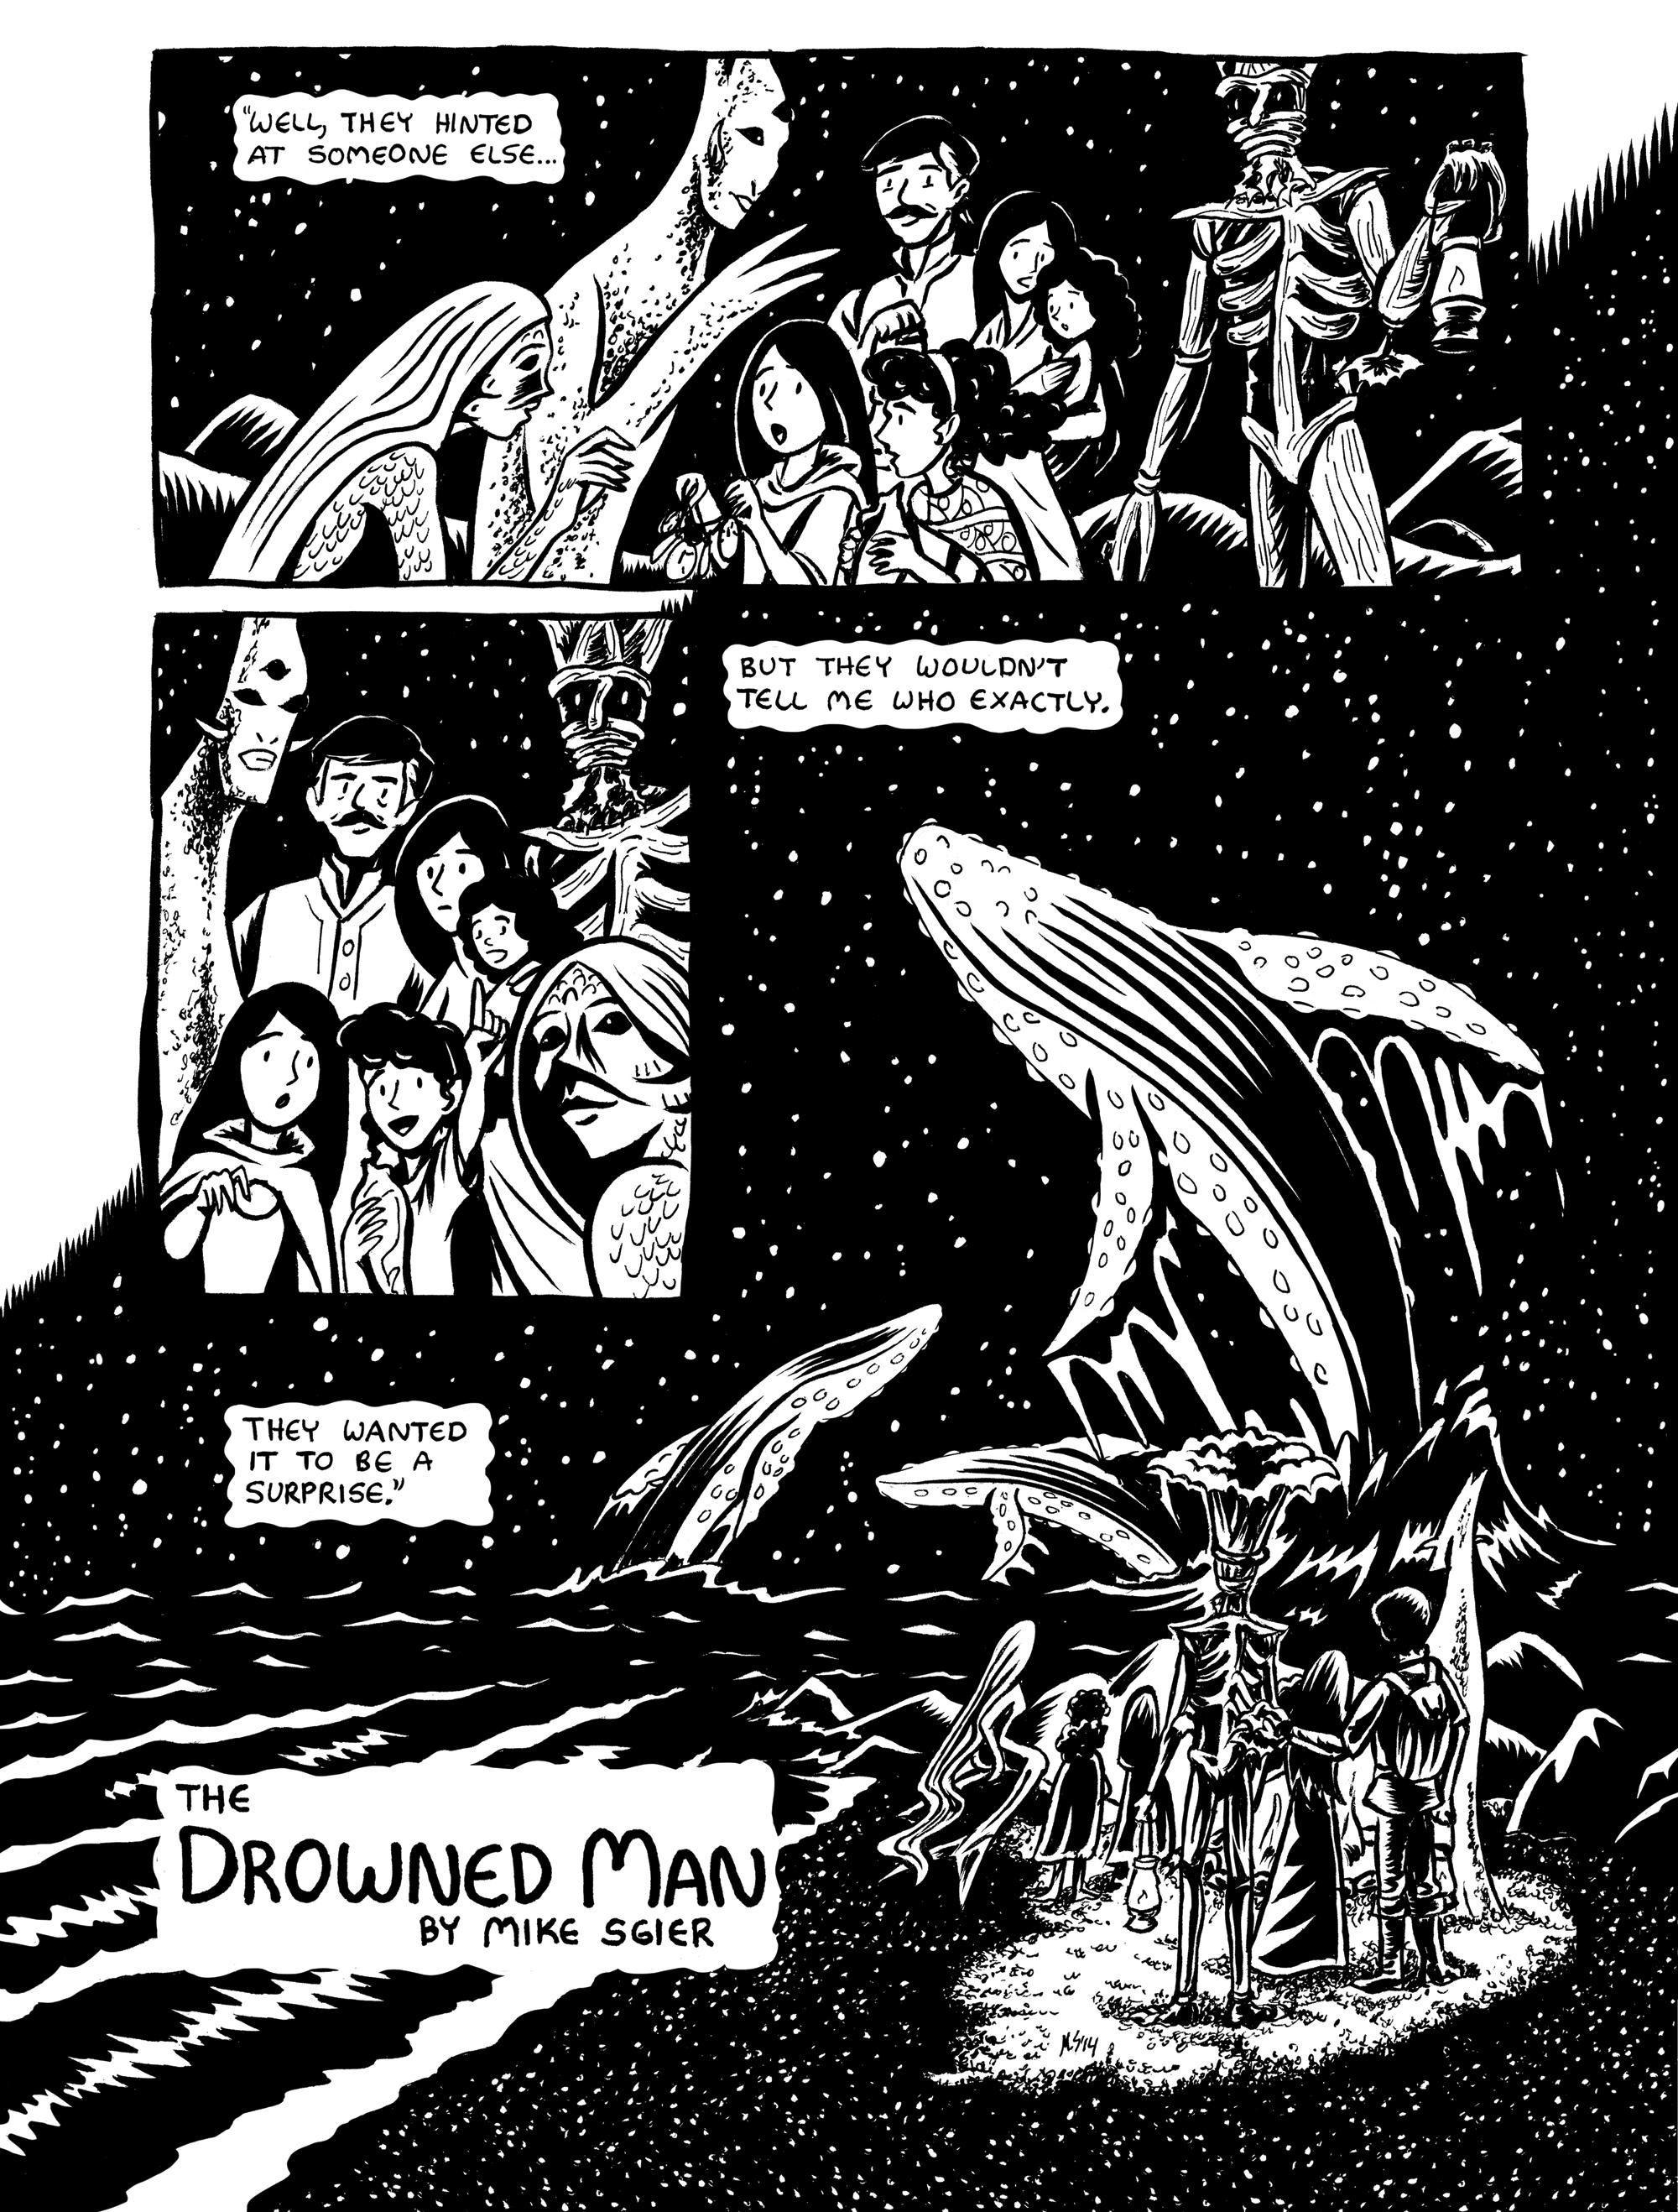 sgier-drowned10.jpg